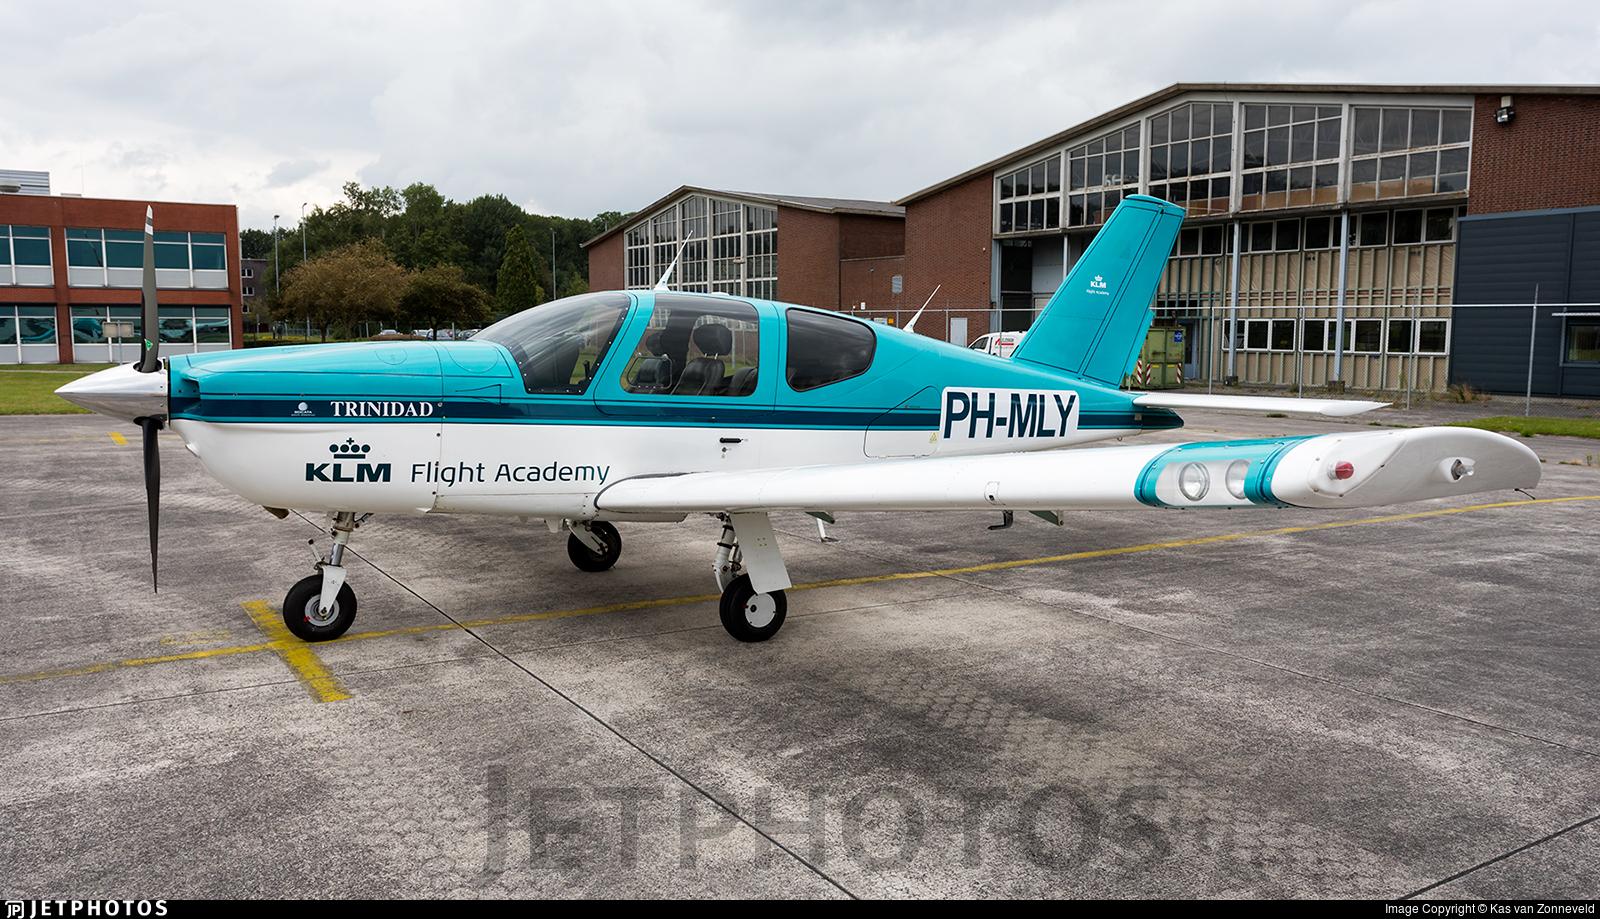 PH-MLY - Socata TB-20 Trinidad - KLM Flight Academy